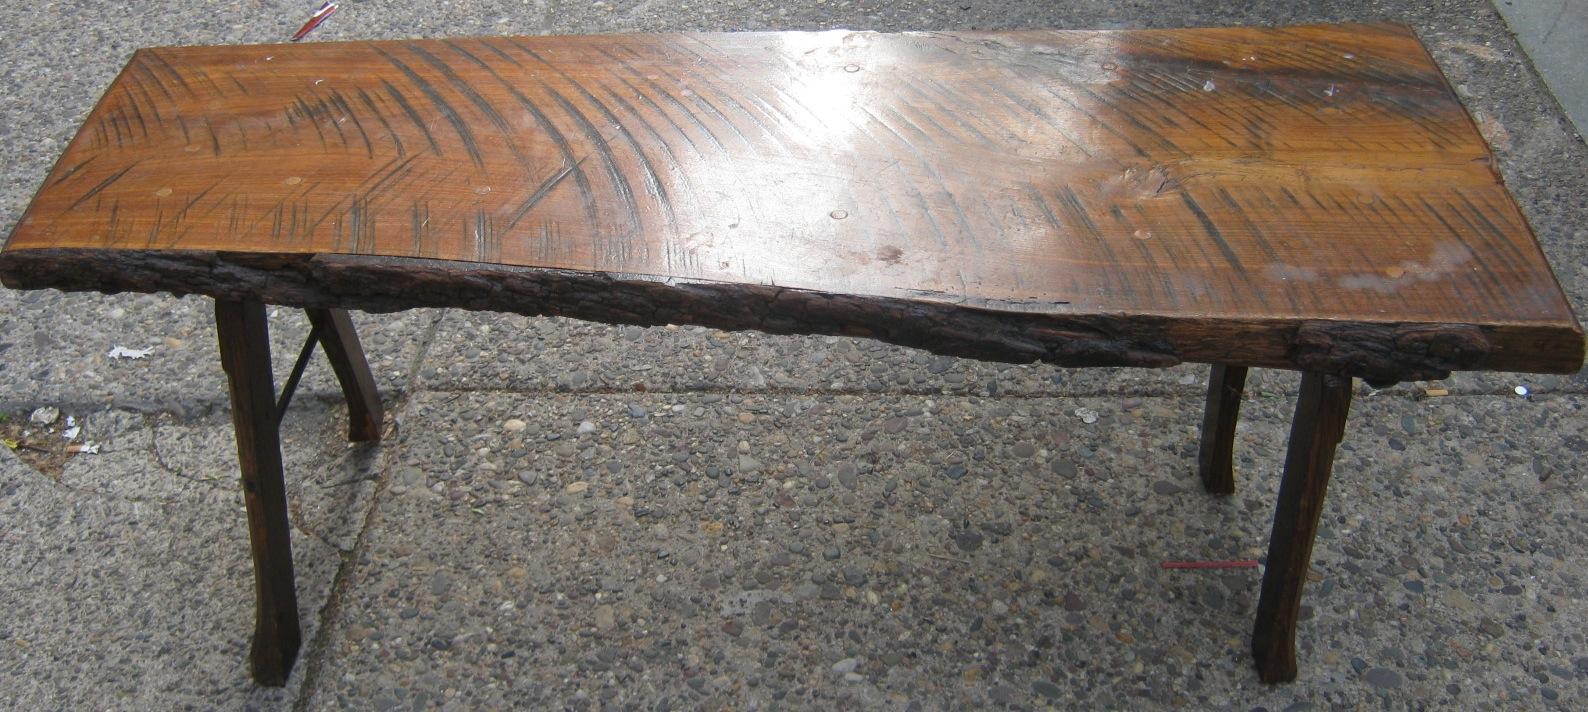 Uhuru furniture collectibles burl wood bench